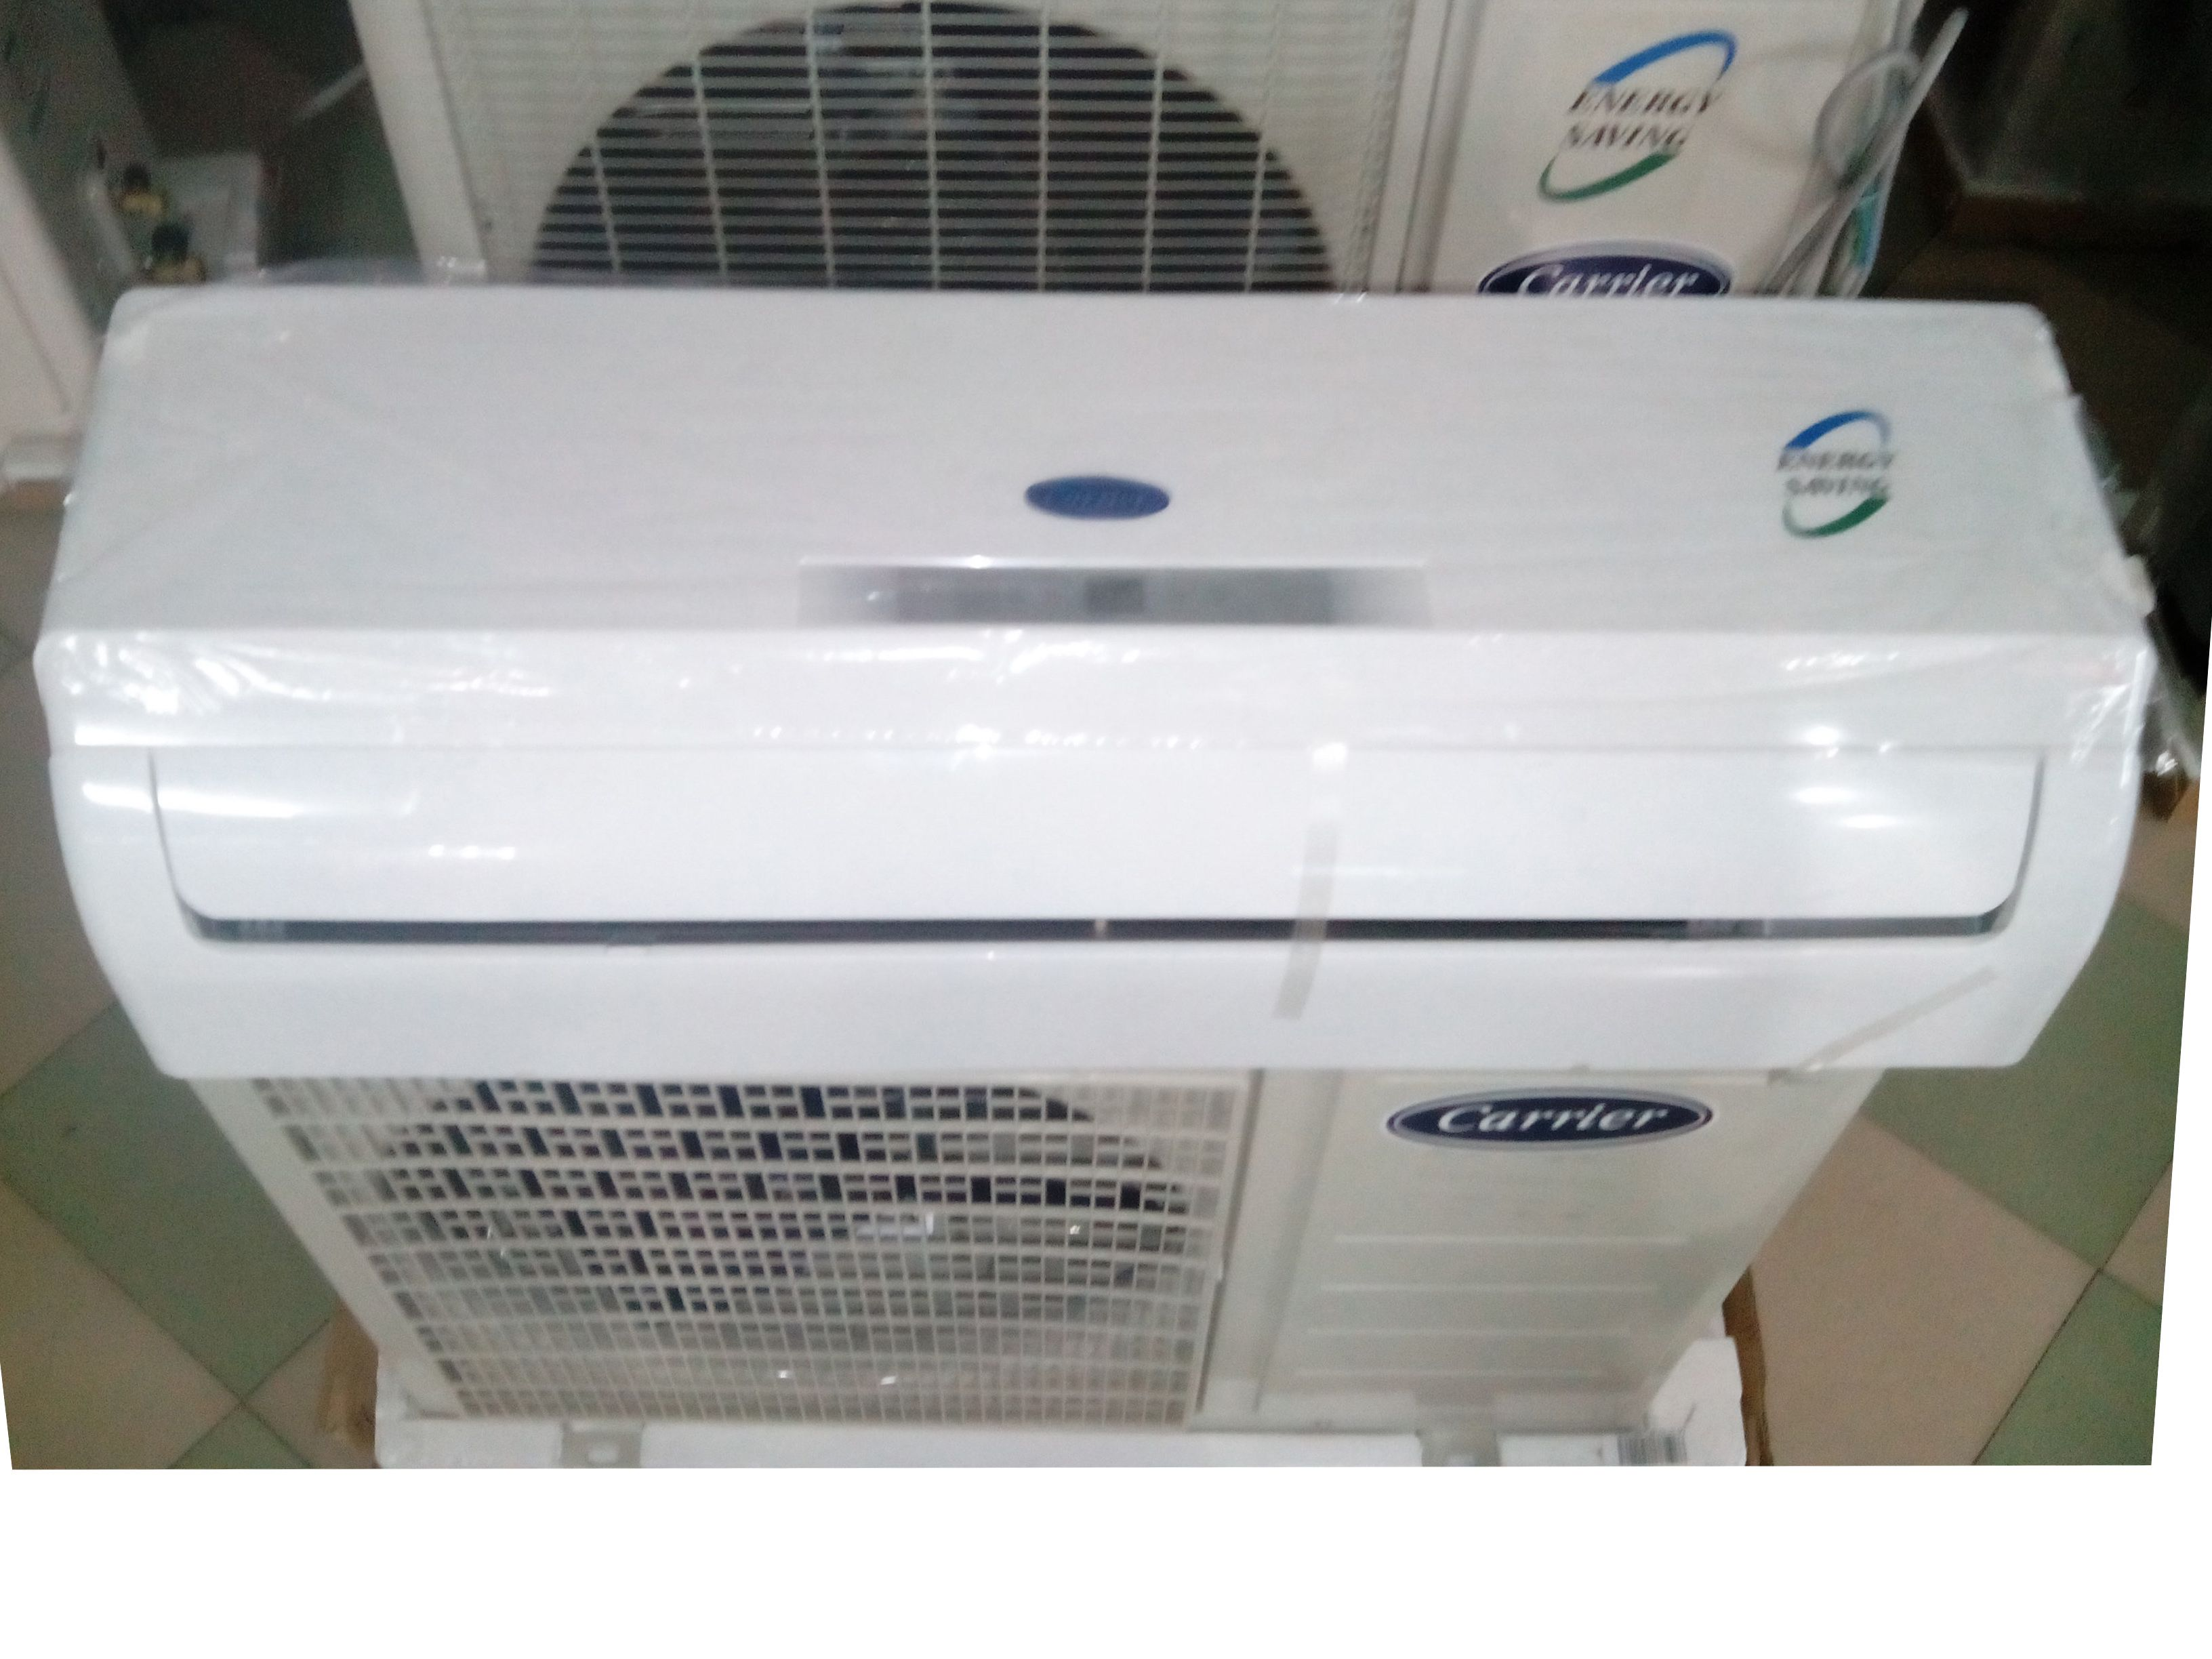 heat ground mitsubishi minisplit pump ductless blogs prices dept com greenbuildingadvisor or hvac qa spotlight source air